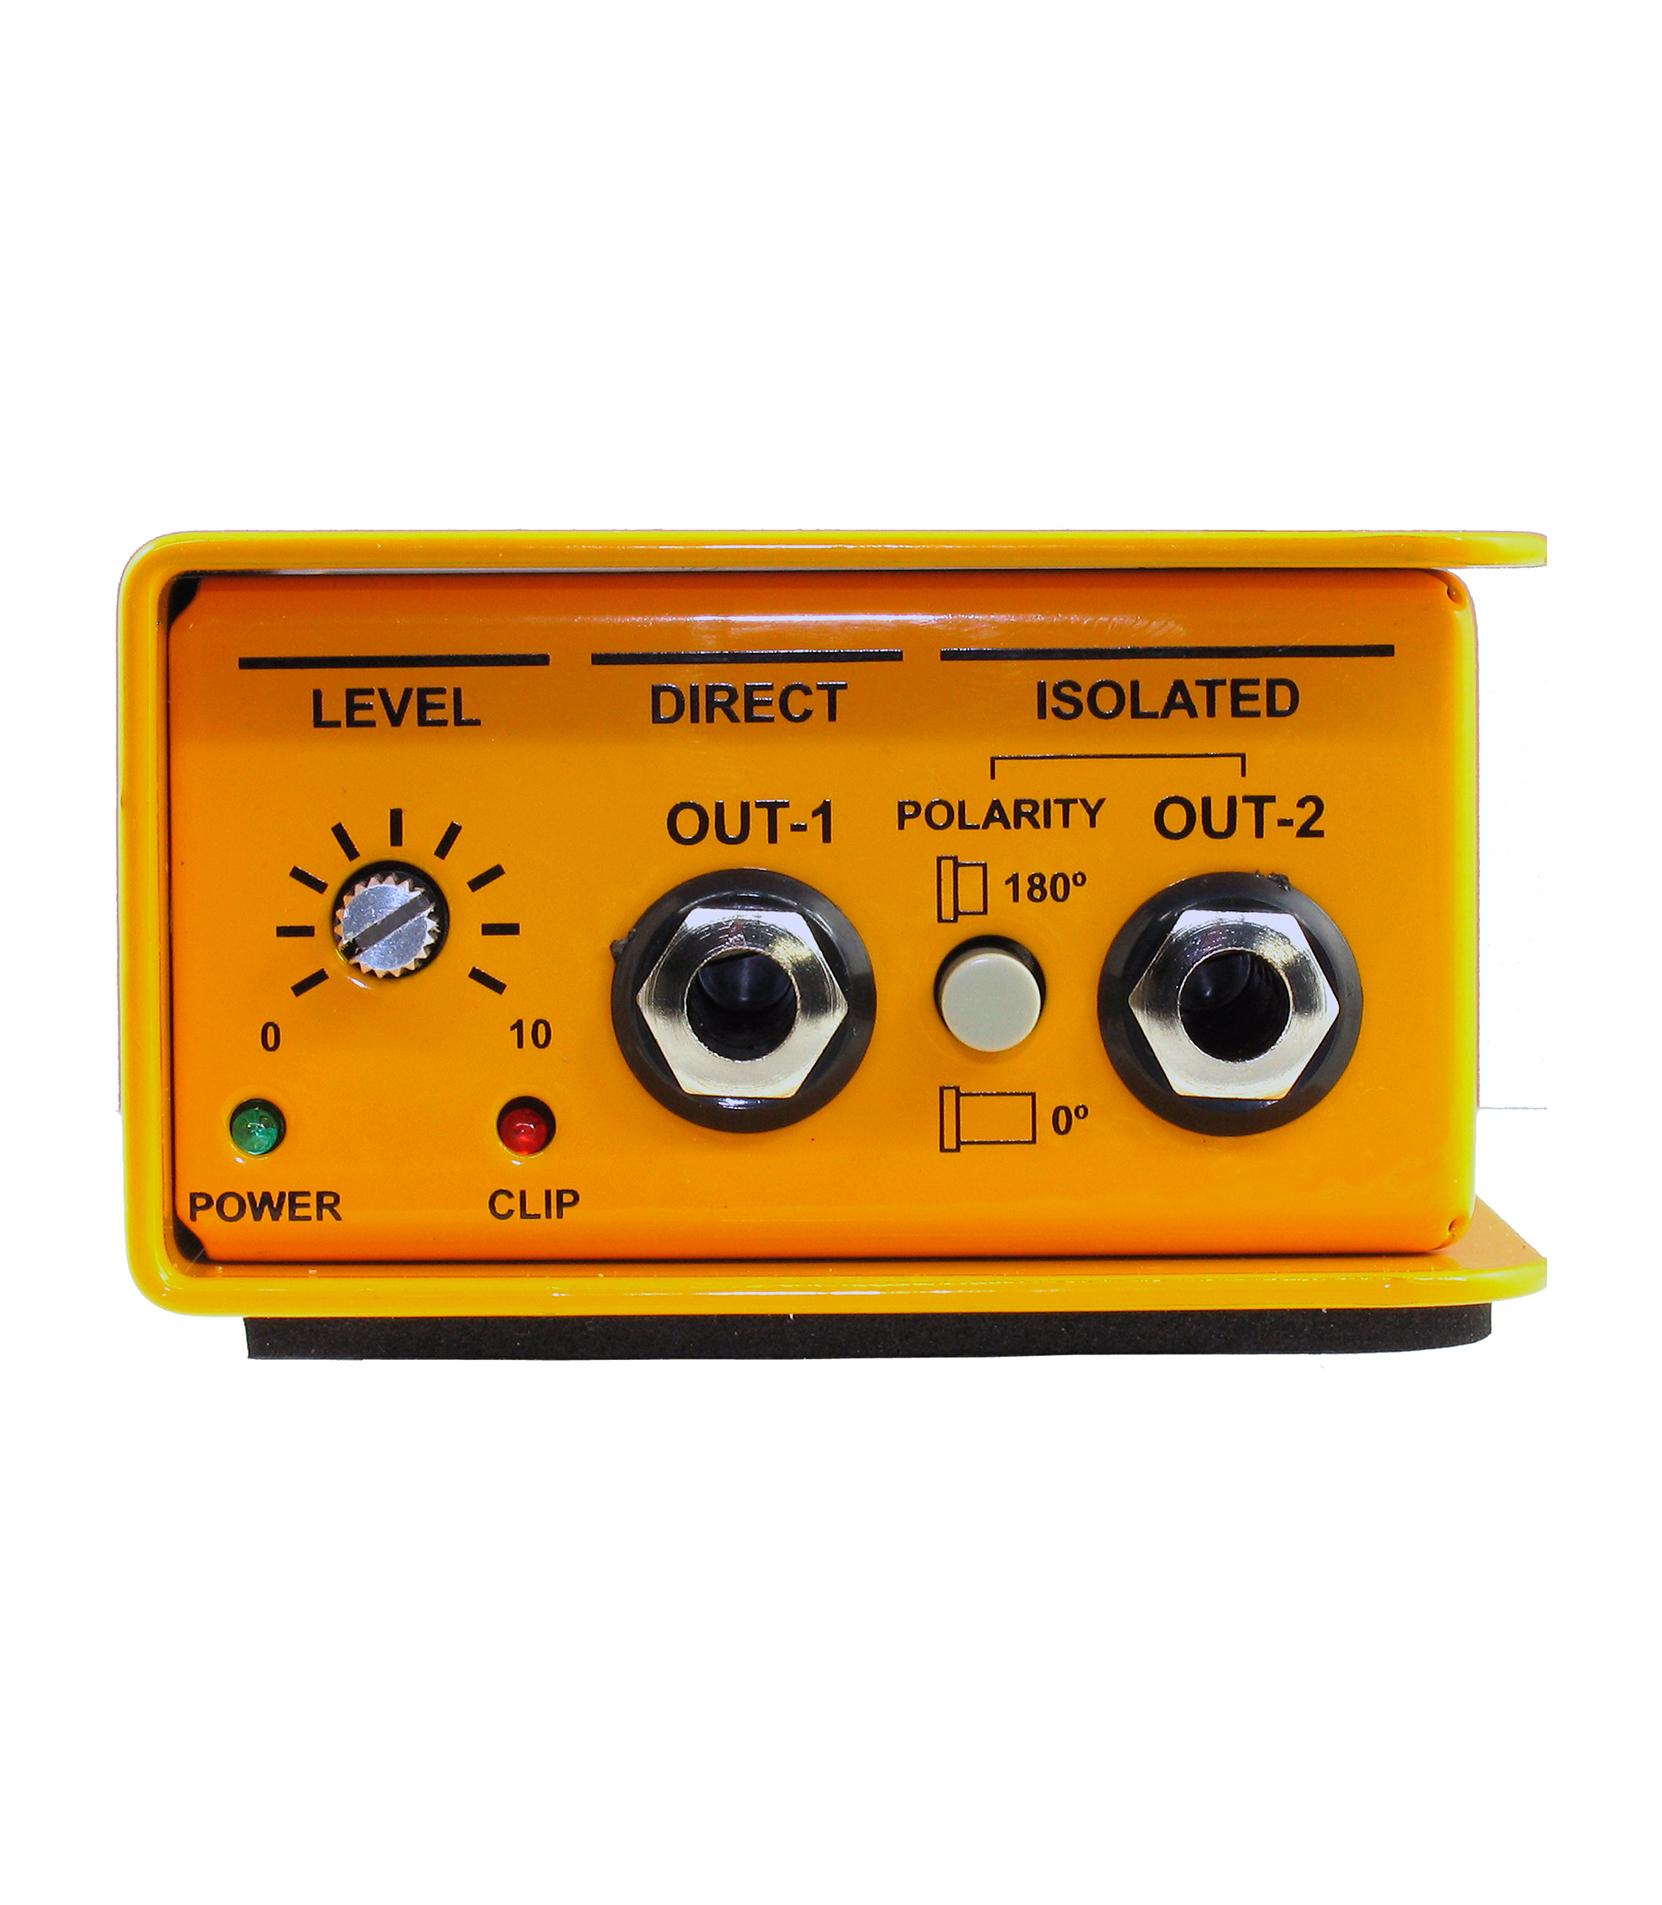 Radial - X Amp - info@melodyhousemi.com